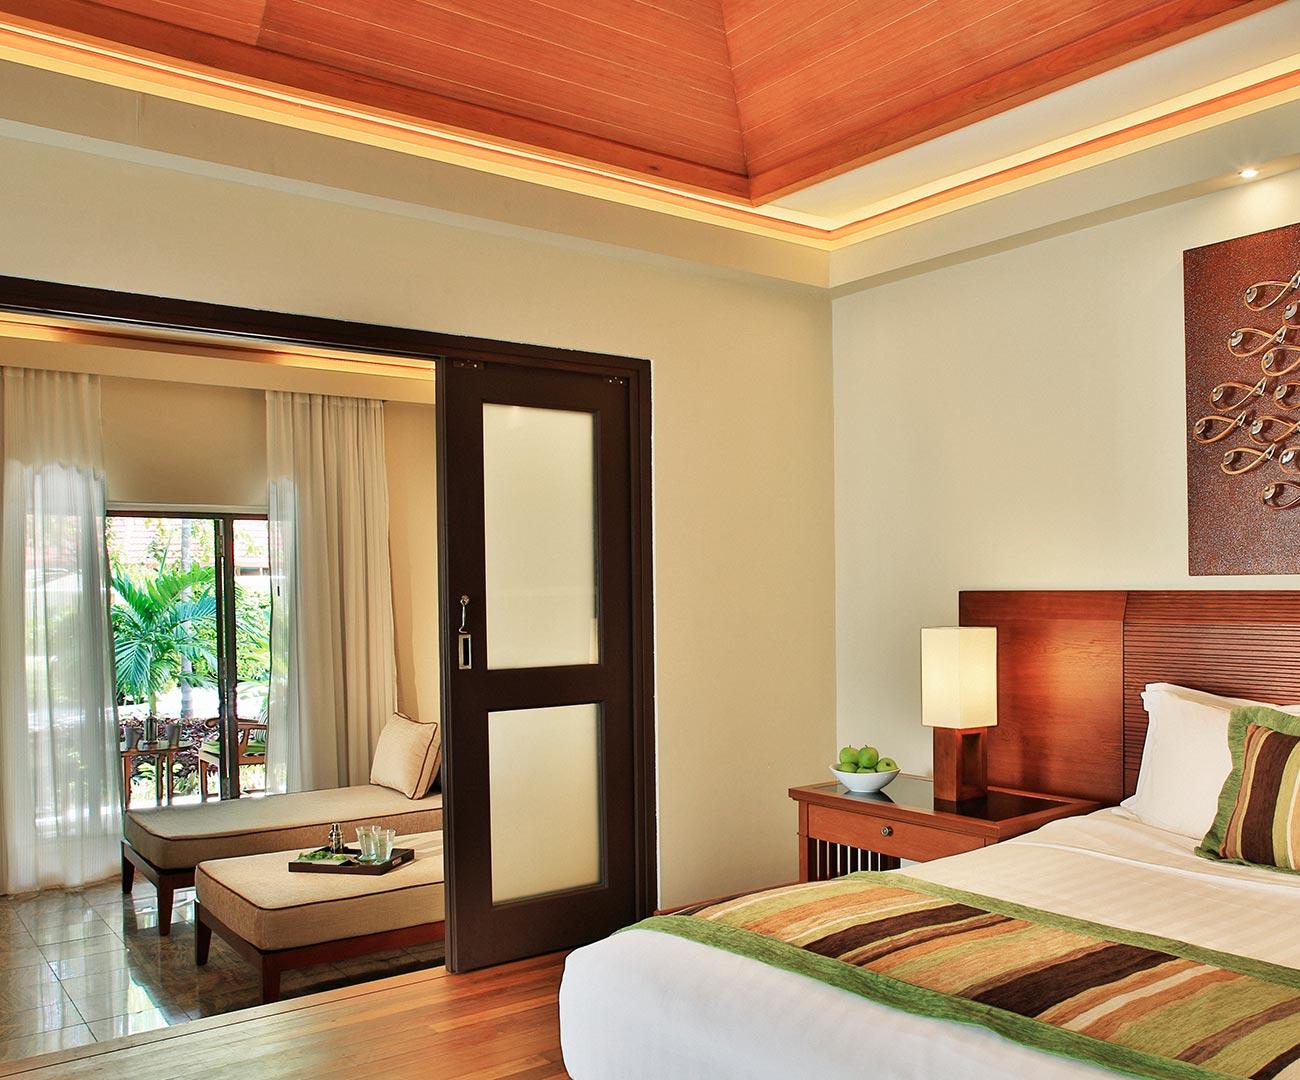 Kurumba Maldives - Garden Pool Villa Bedroom Image - Maldives Resort